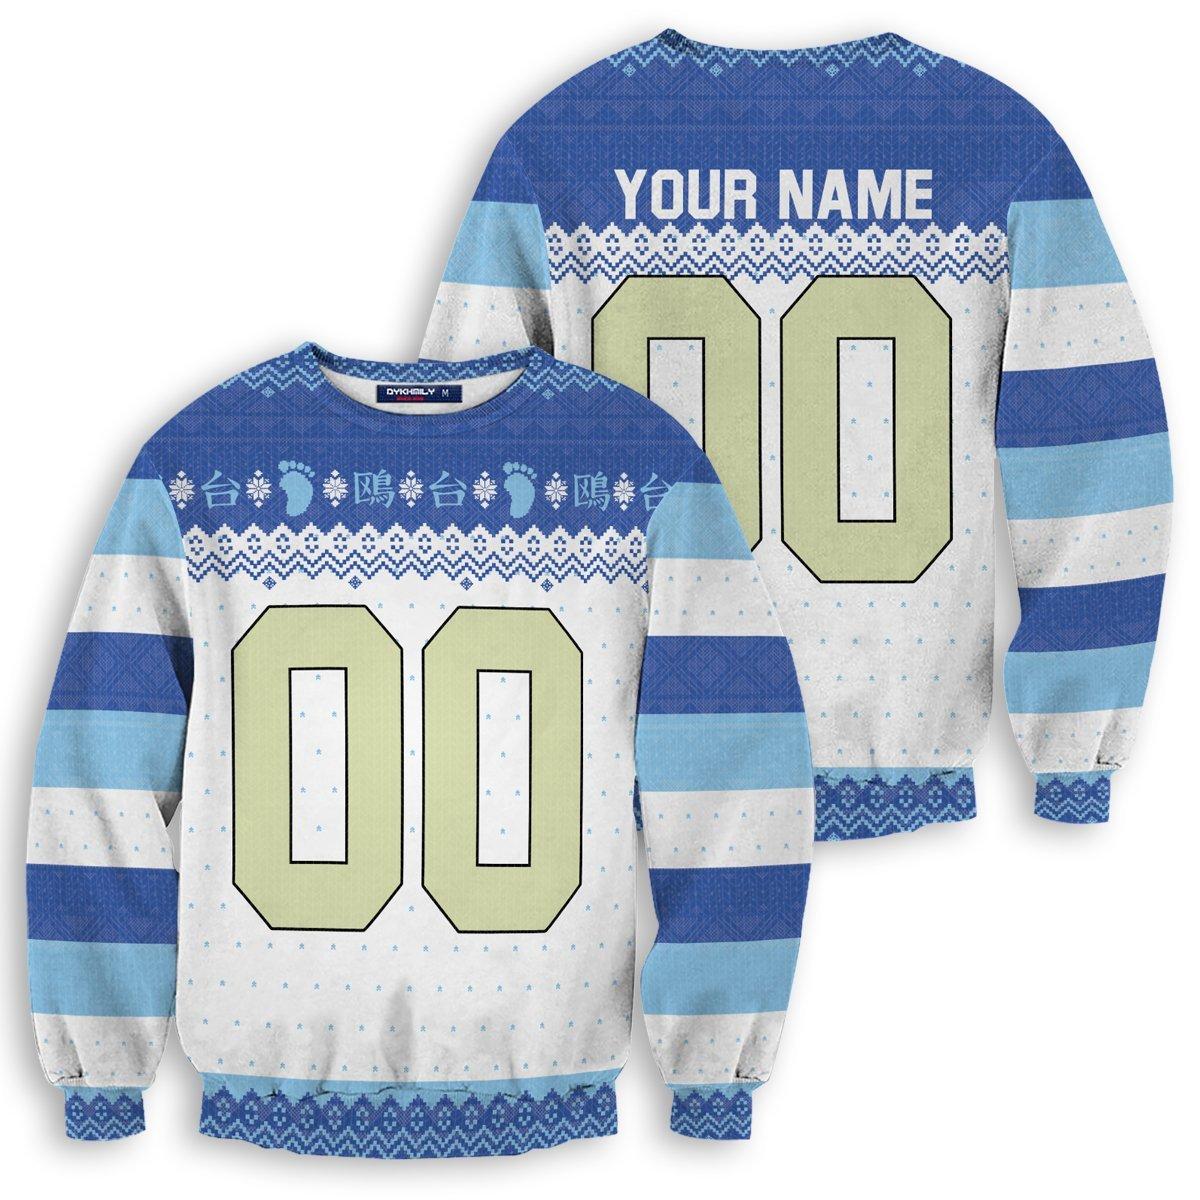 Personalized Kamomedai Christmas Unisex Wool Sweater FDM0310 S Official Otaku Treat Merch